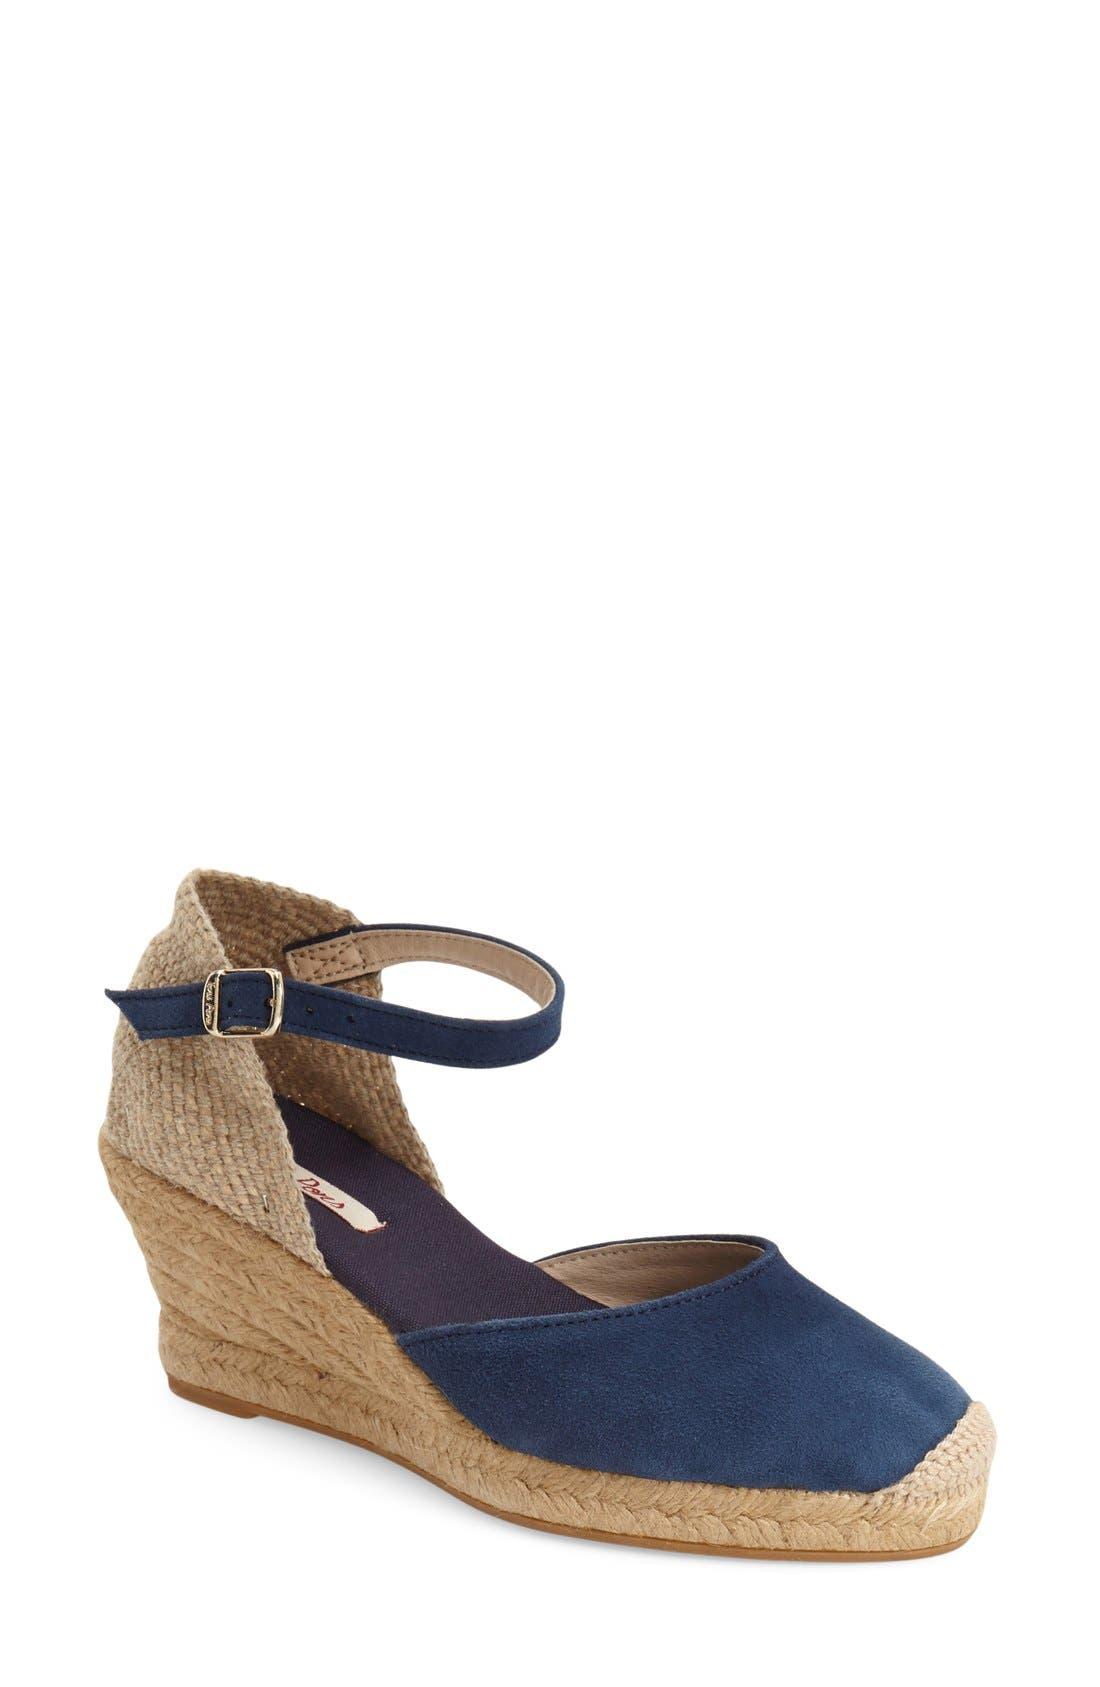 'Lloret-5' Espadrille Wedge Sandal,                         Main,                         color, NAVY SUEDE